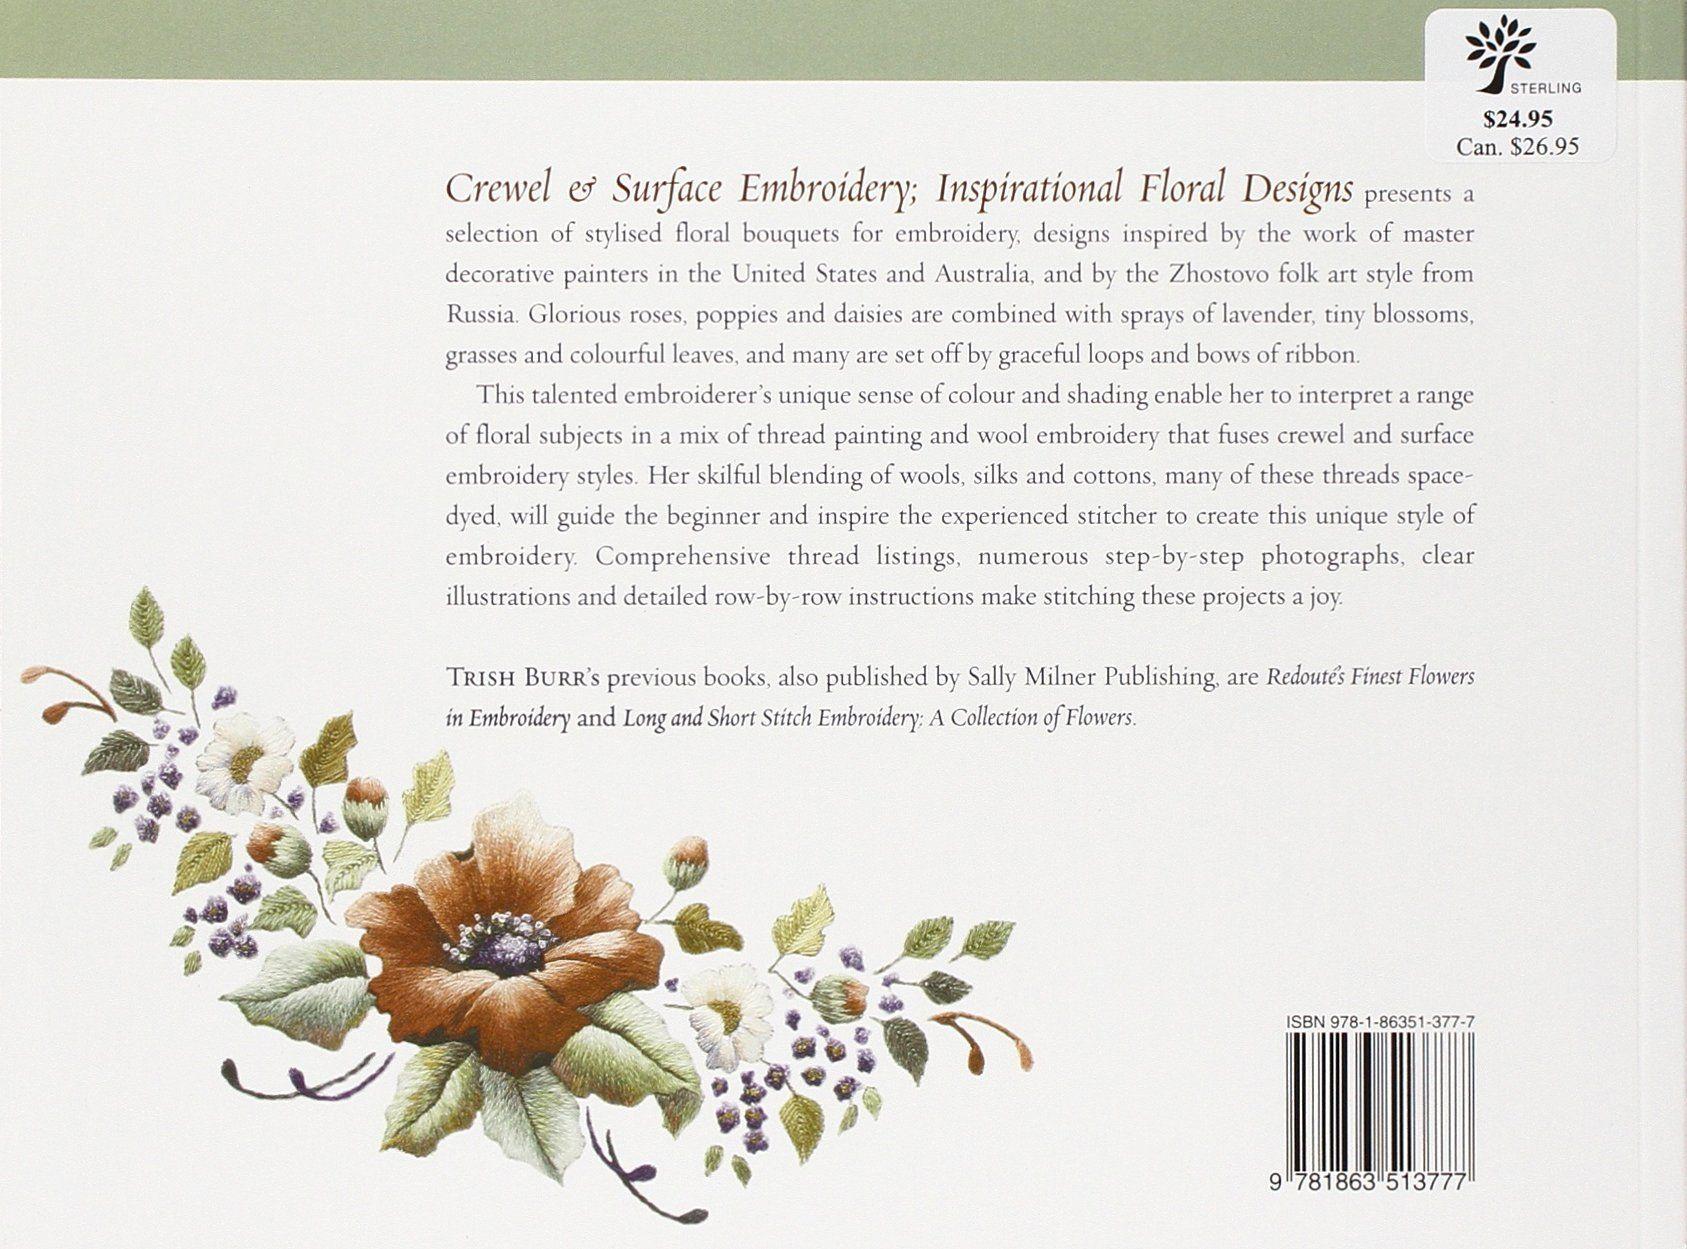 Crewel u surface embroidery inspirational floral designs milner